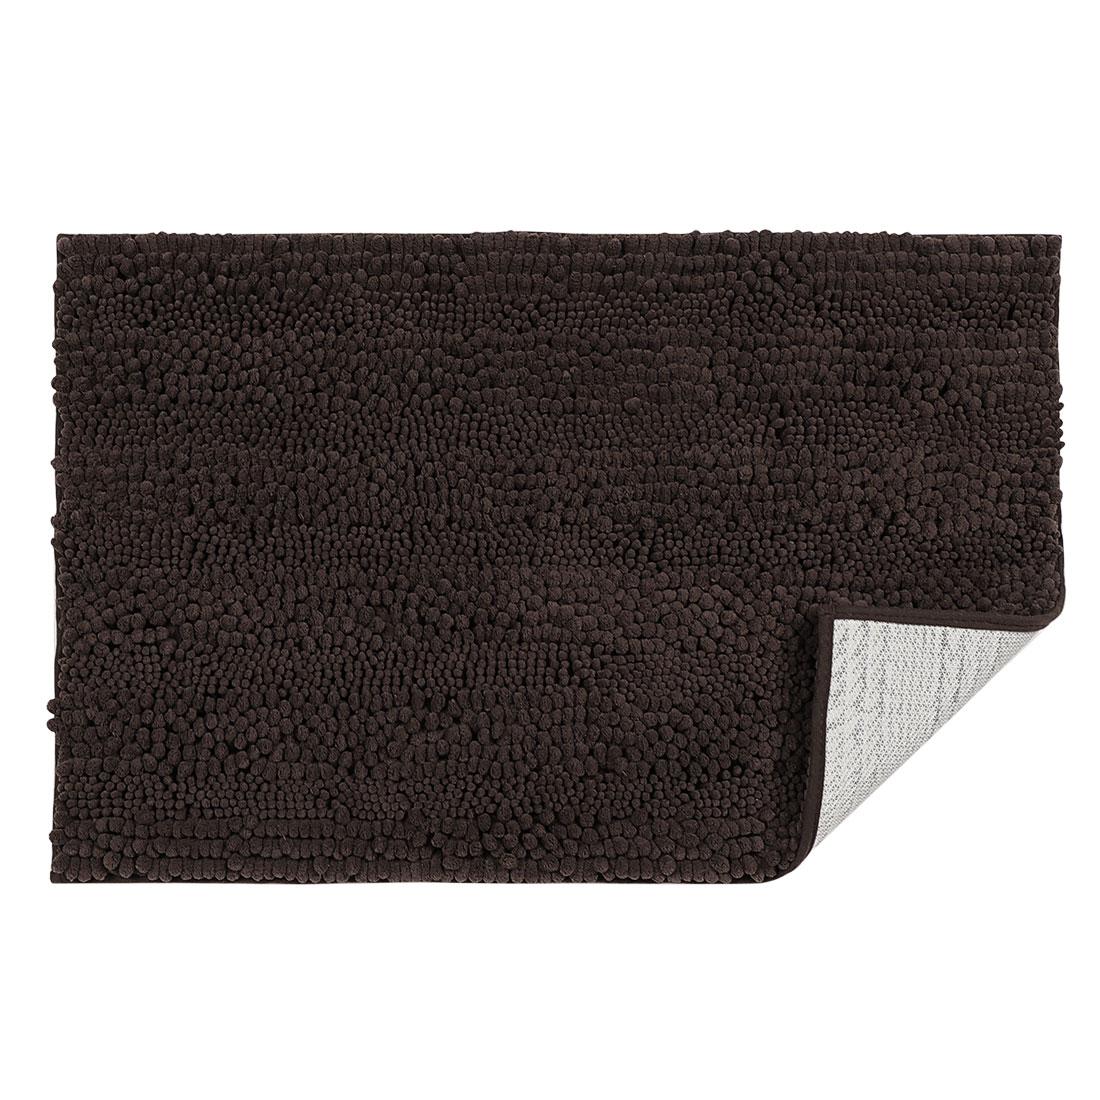 20 x 32 Inch Luxury Soft Plush Shaggy Bath Mat Chenille Rug Carpet Coffee Color